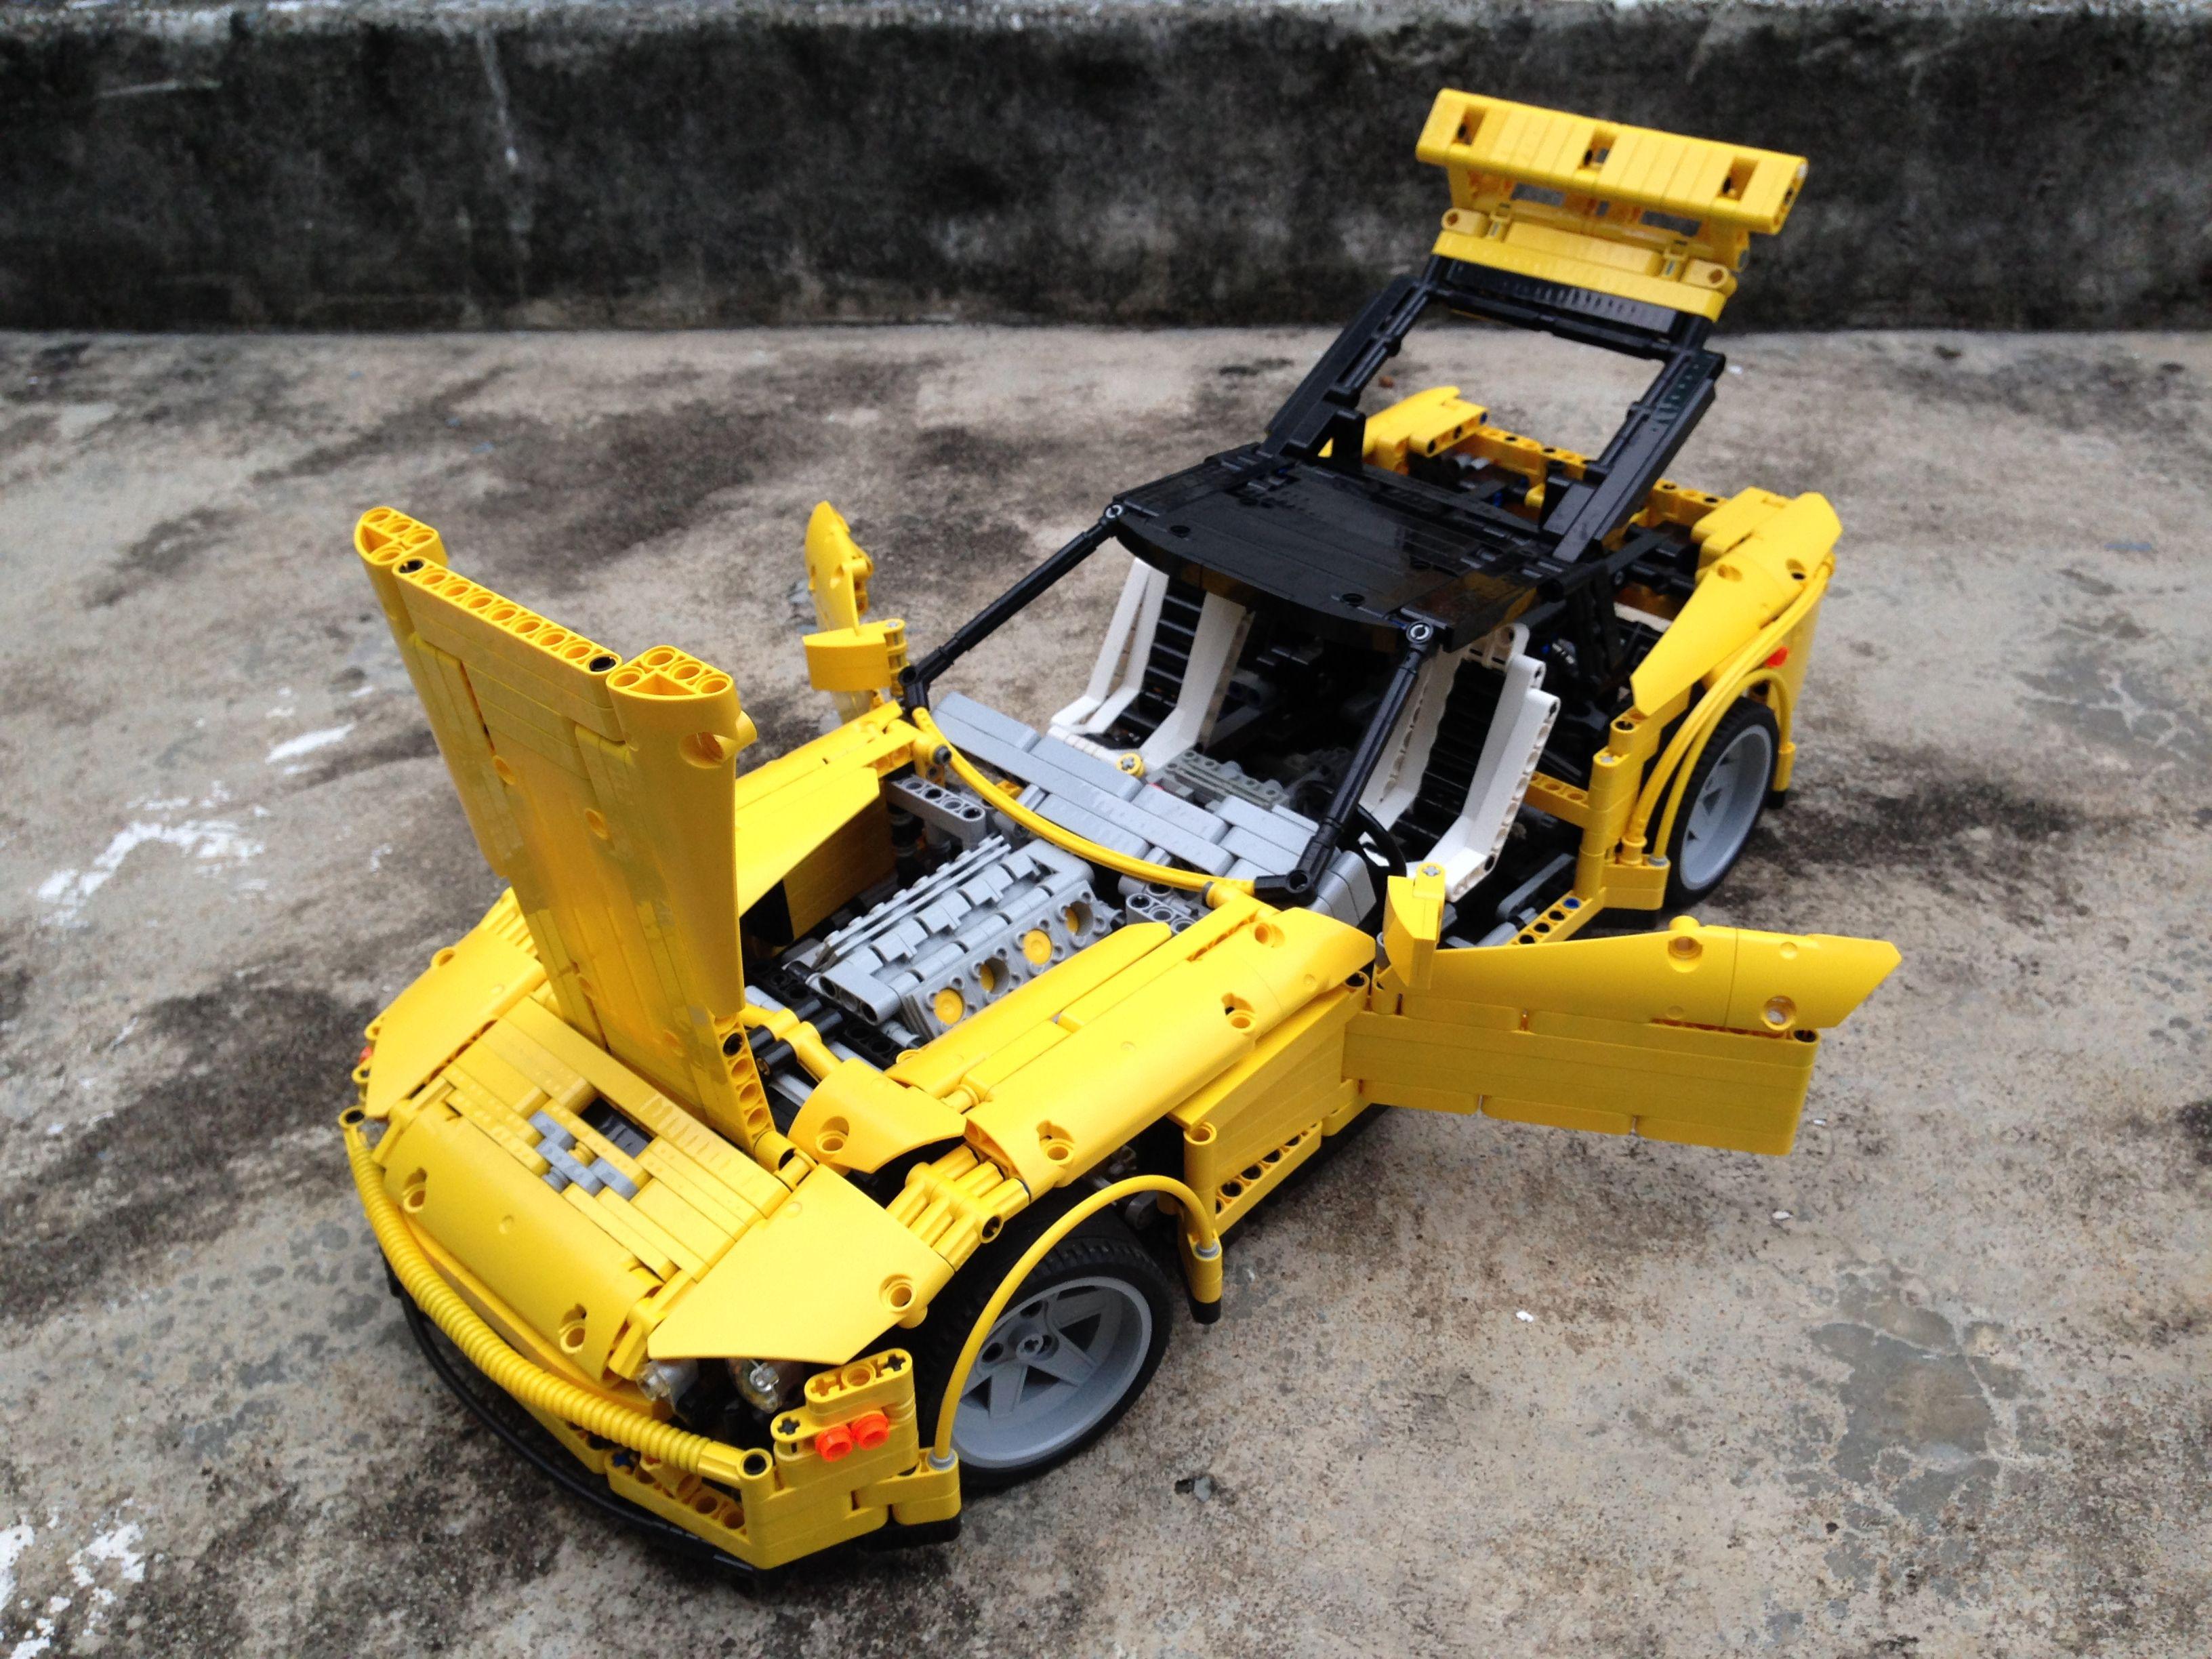 Black Top Yellow Corvette Lego technic, Lego toys, Best